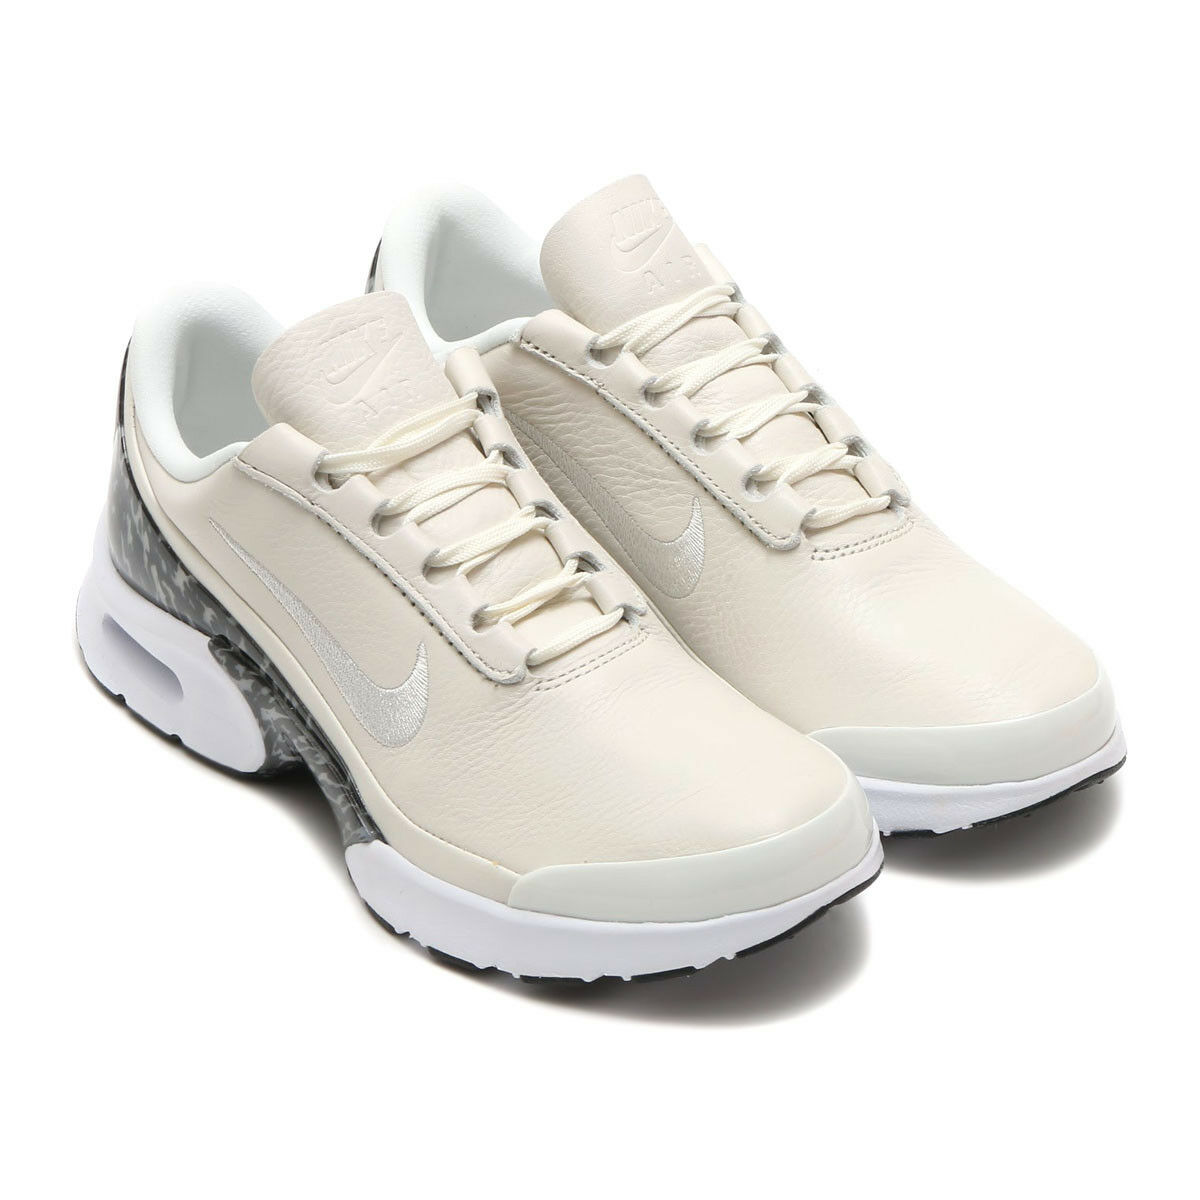 Nike Womens W Air Max Jewell LX Sail White Black 896196 100 6 6.5 7 7.5 8 8.5 Cheap and beautiful fashion